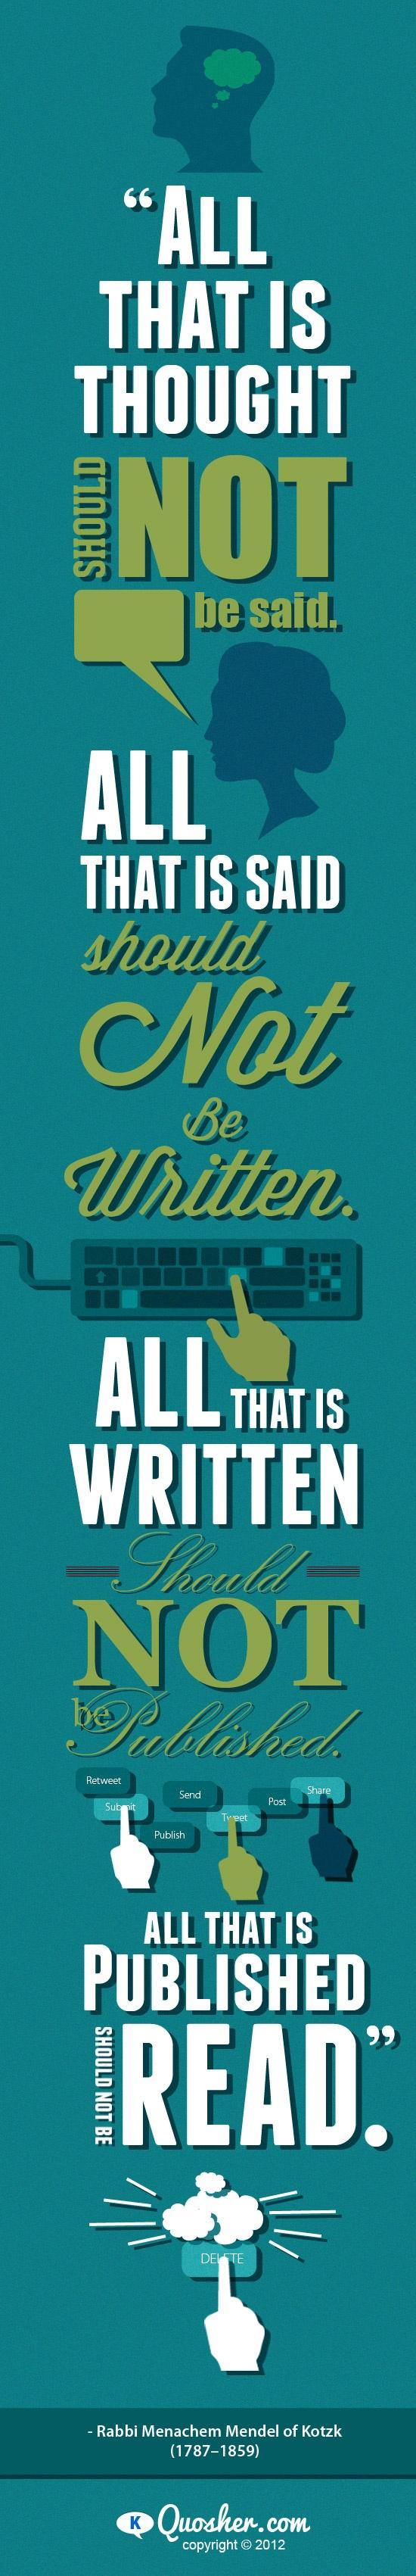 Wisdom for the digital age.